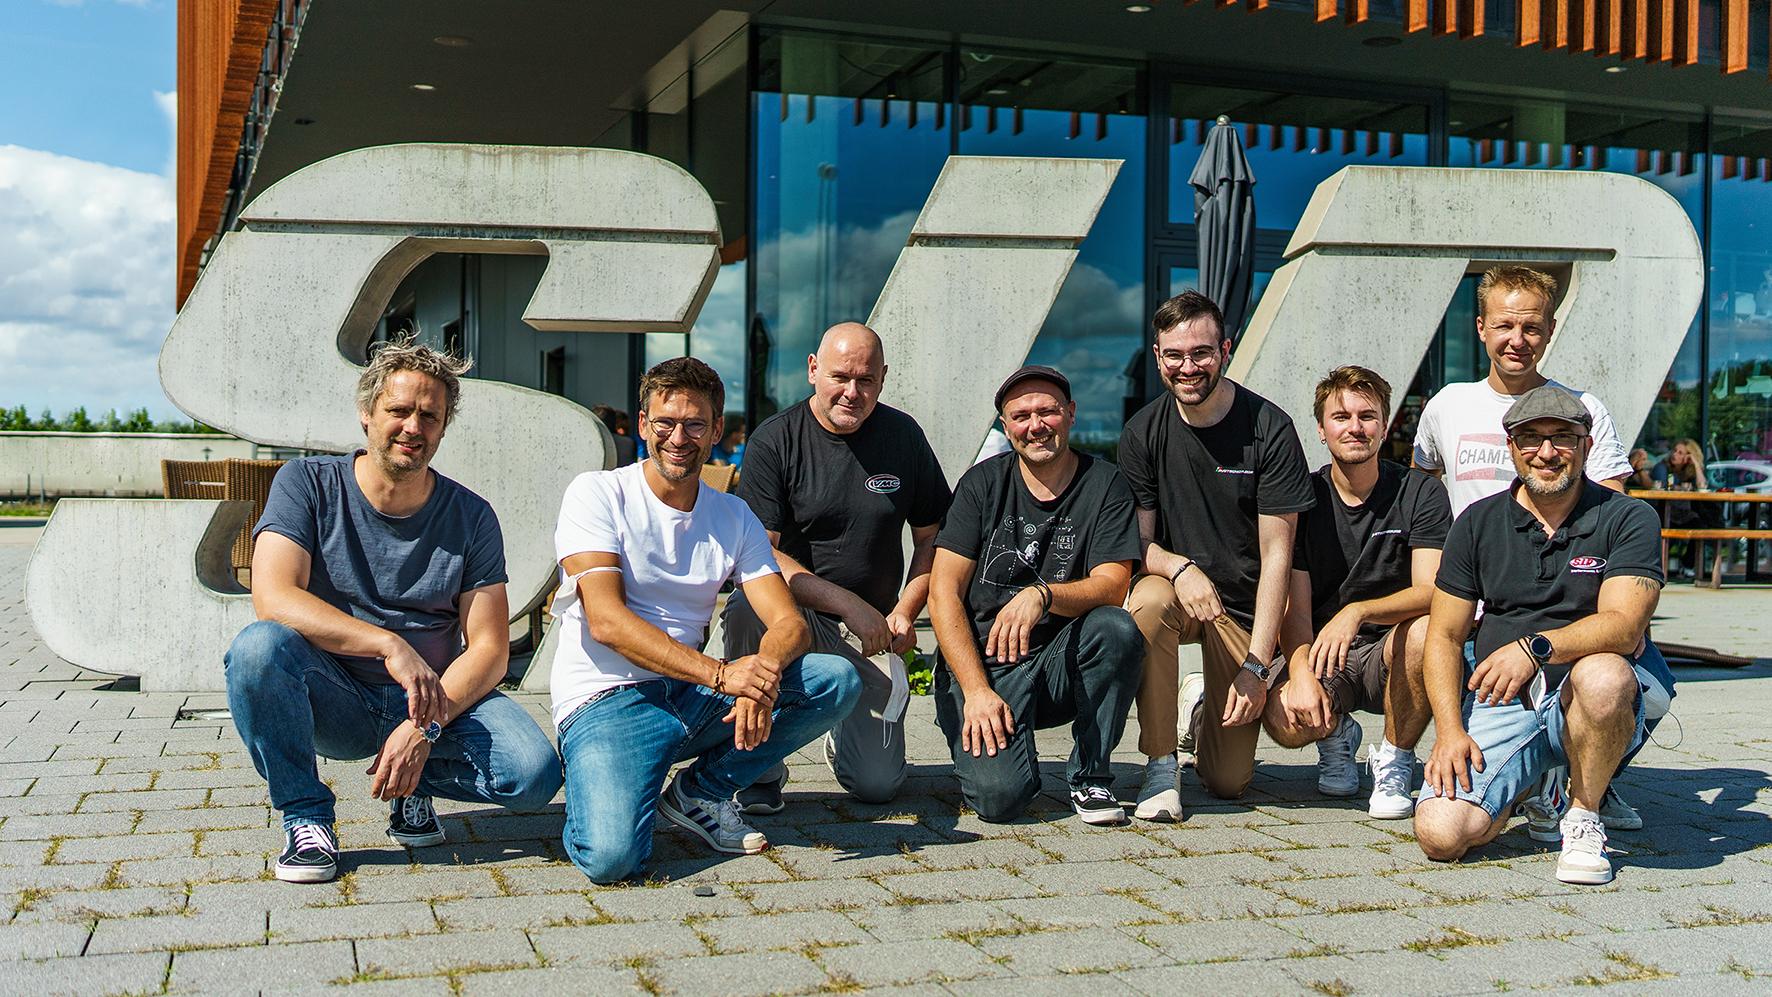 VMC zu Besuch bei SIP Scootershop. Von links nach rechts: Jesco, Alex (SIP), Giustino, Alberto, Andrea, Stefano (VMC), André, Luigi (SIP)